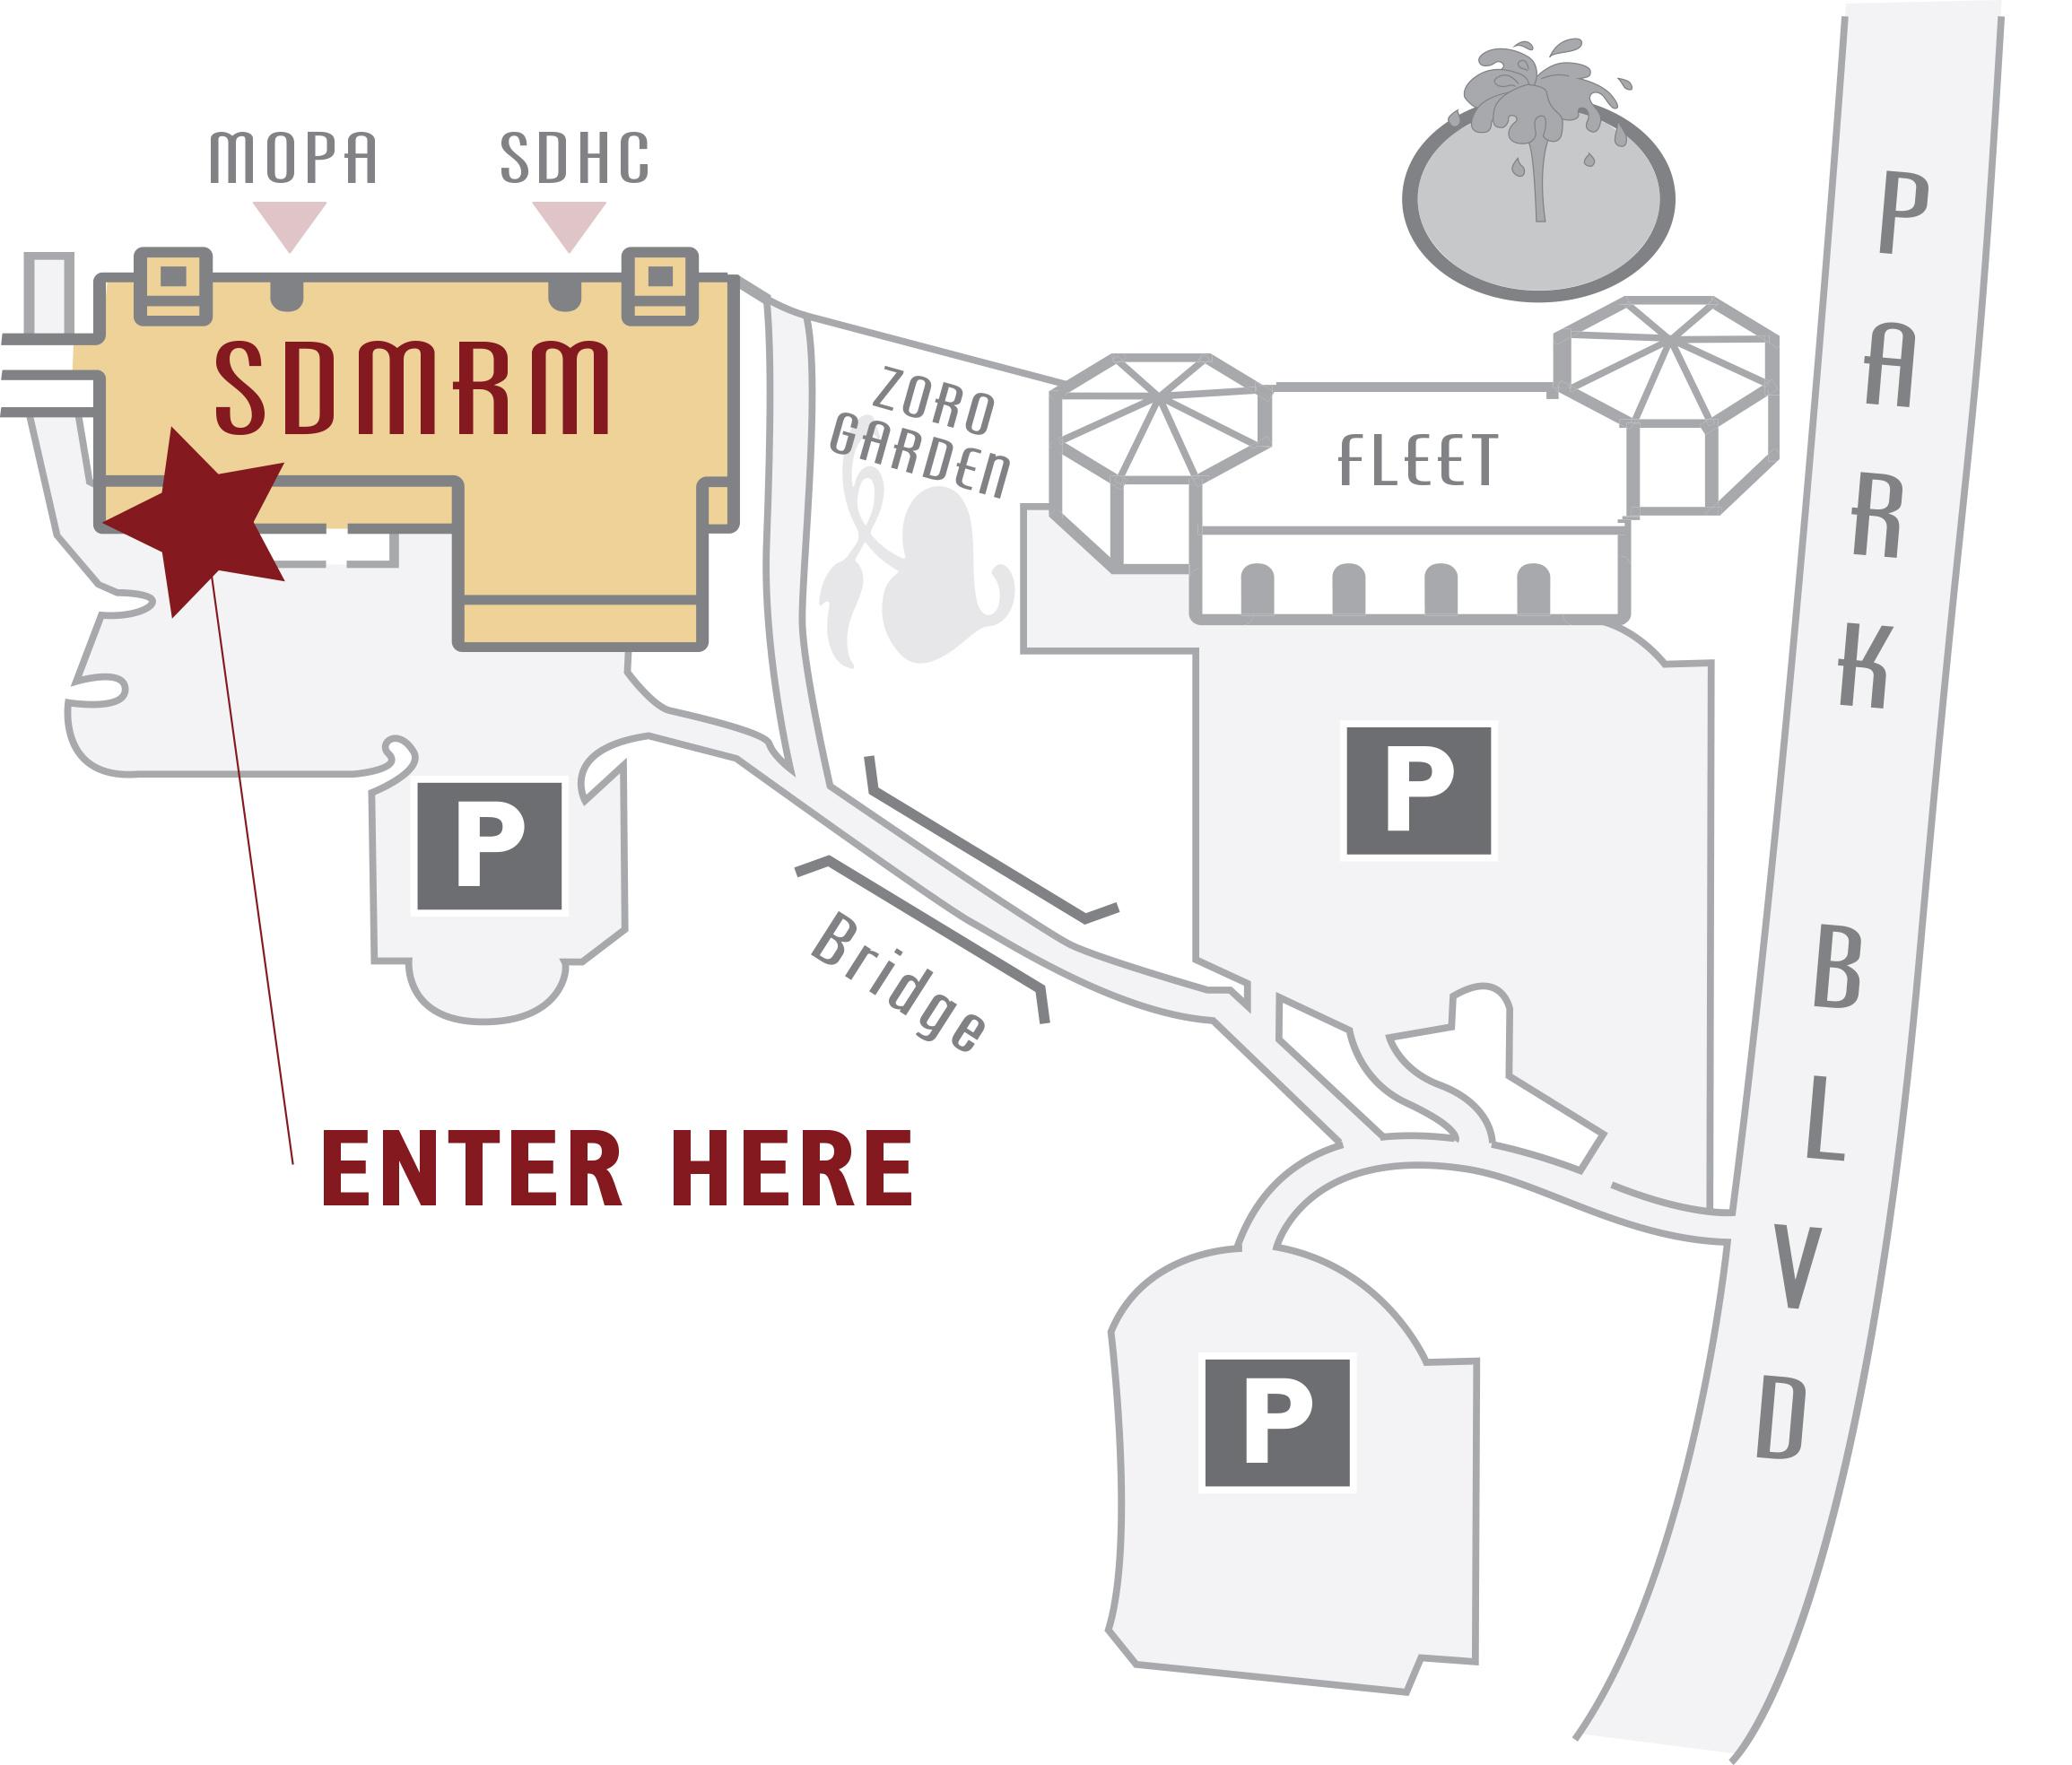 map-to-back-entrance-of-sdmrm.jpg